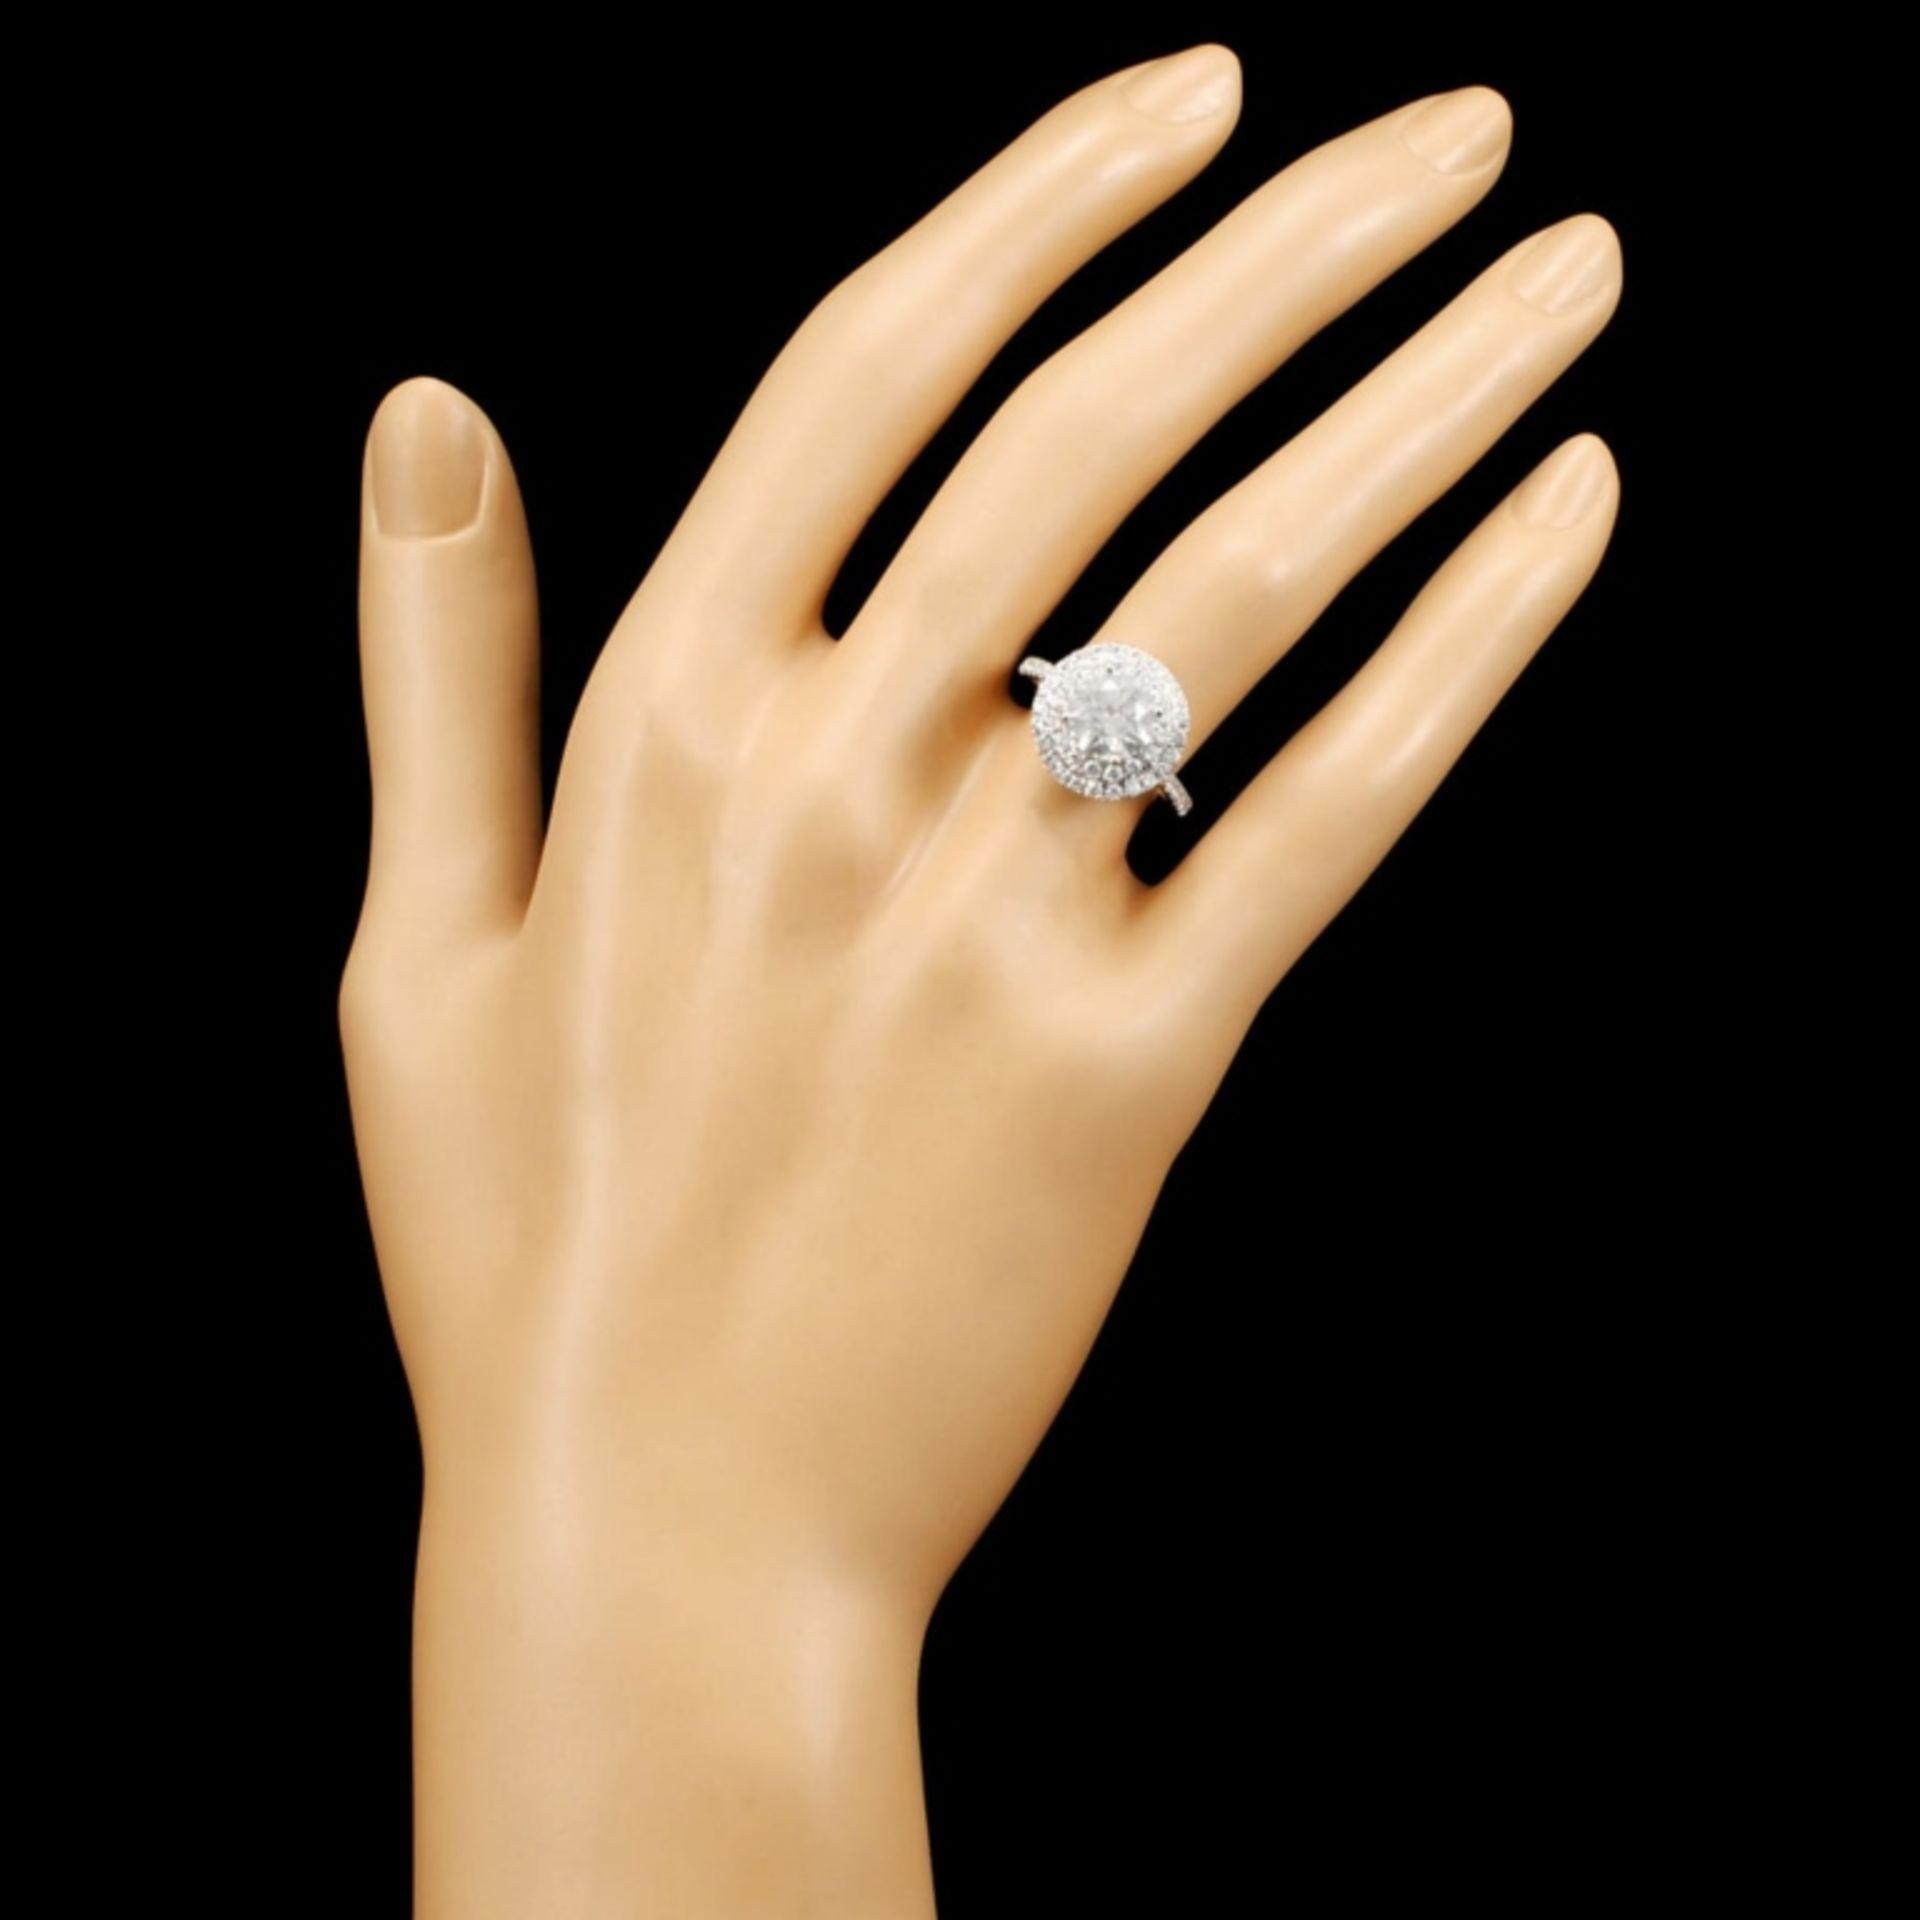 18K Gold 2.73ctw Diamond Ring - Image 6 of 7